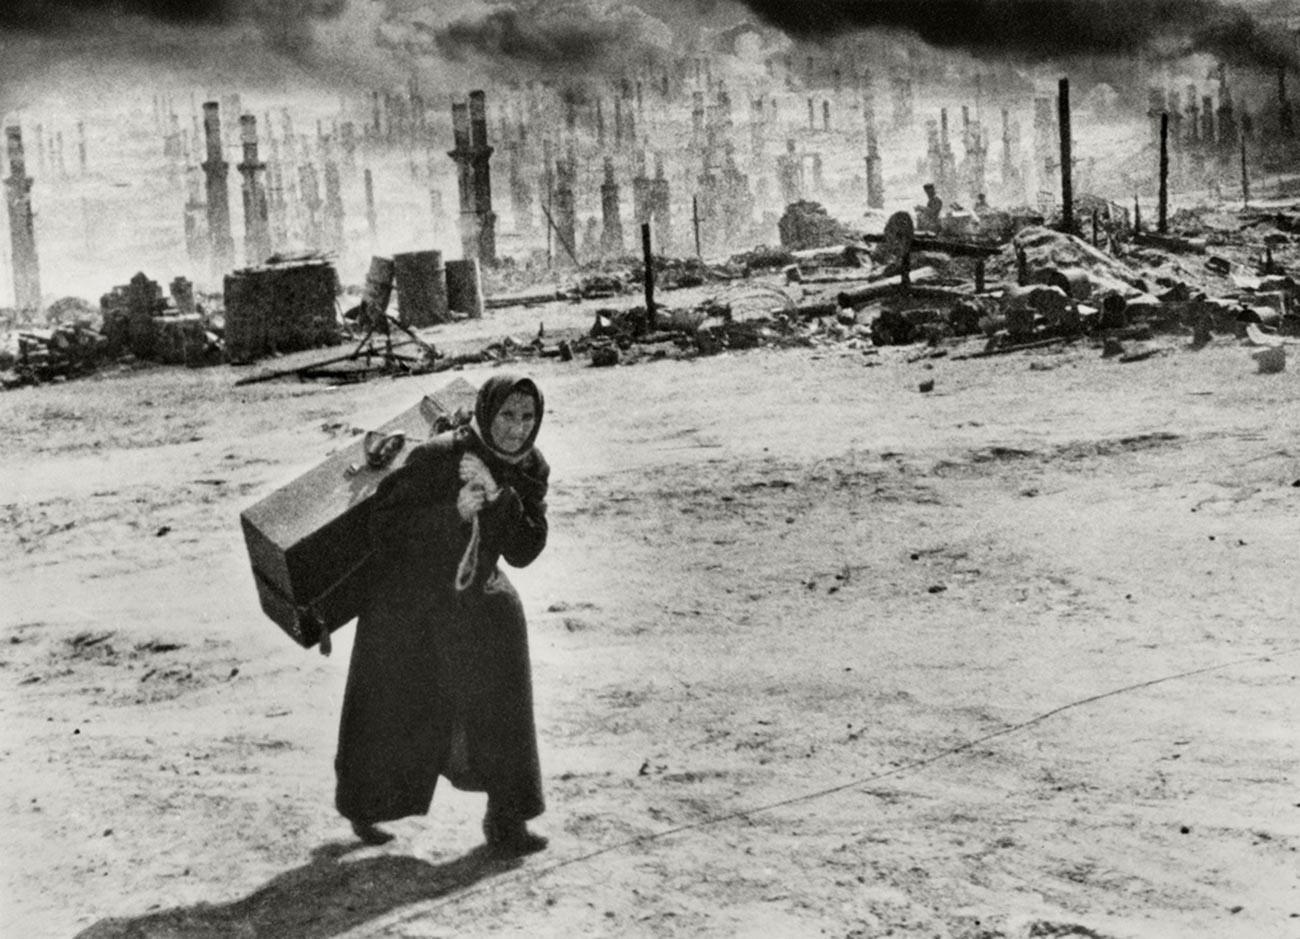 Pemandangan setelah pesawat Nazi mengebom Murmansk.